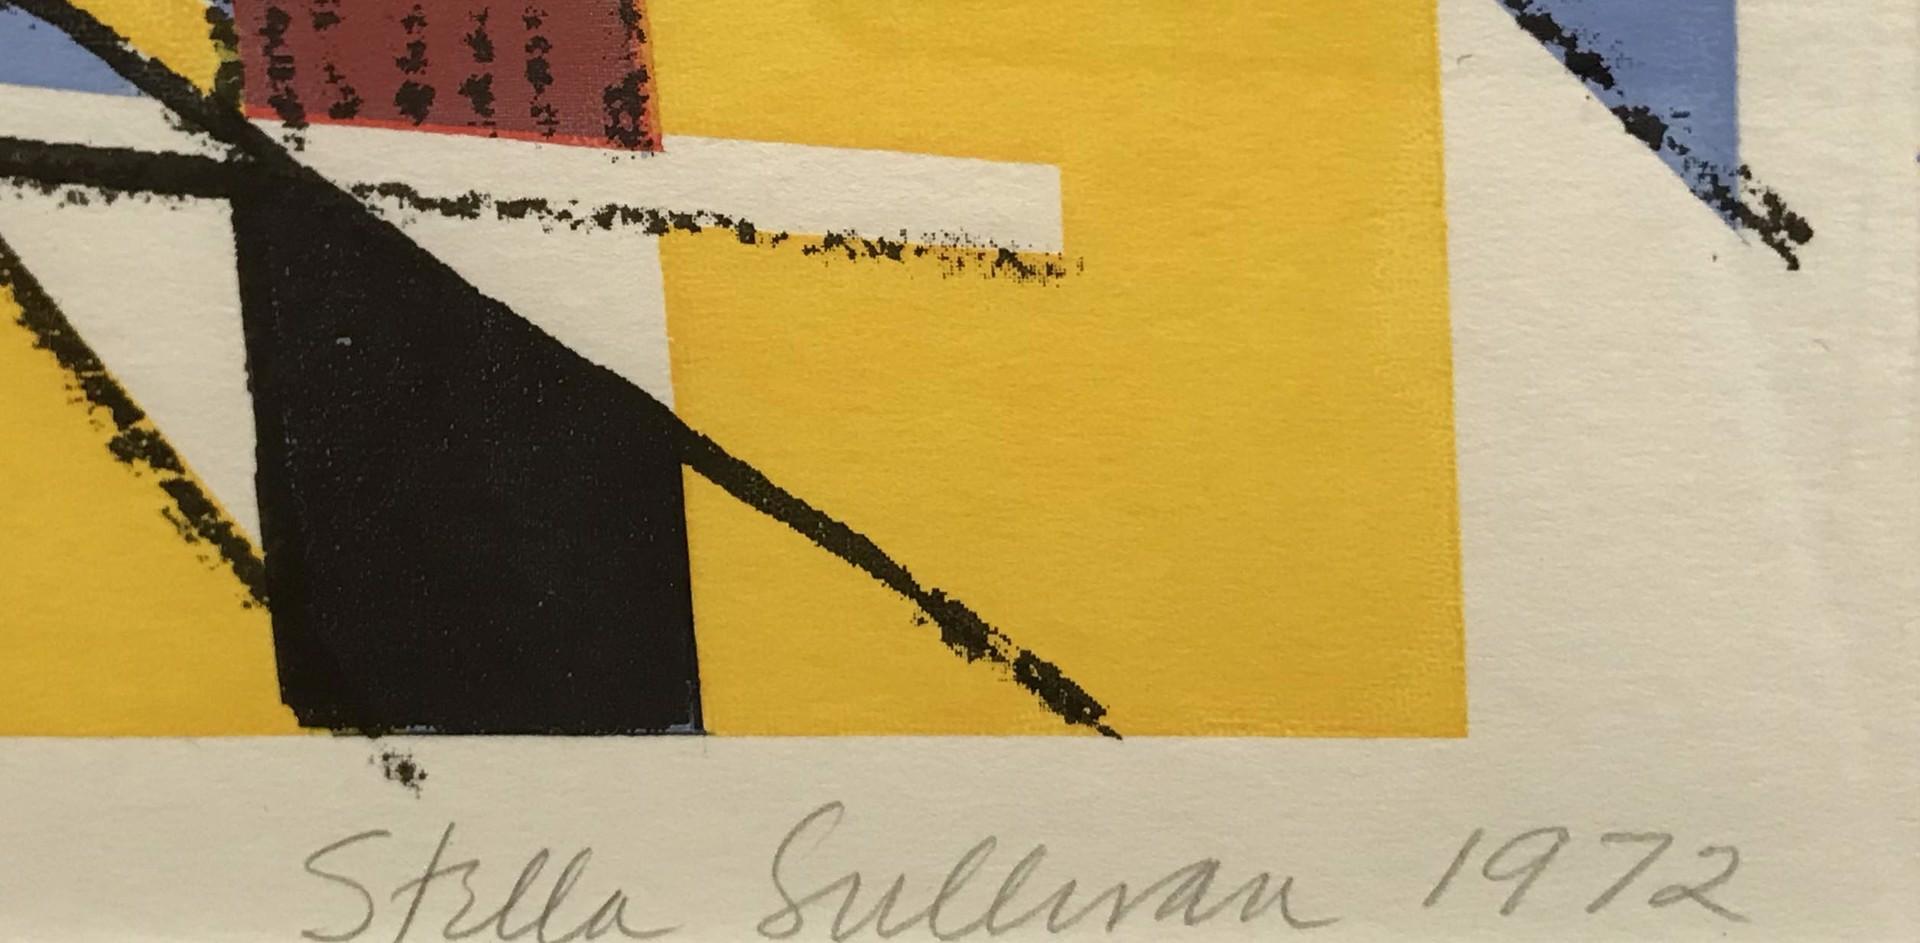 Summer Houses by Stella Sullivan Prints